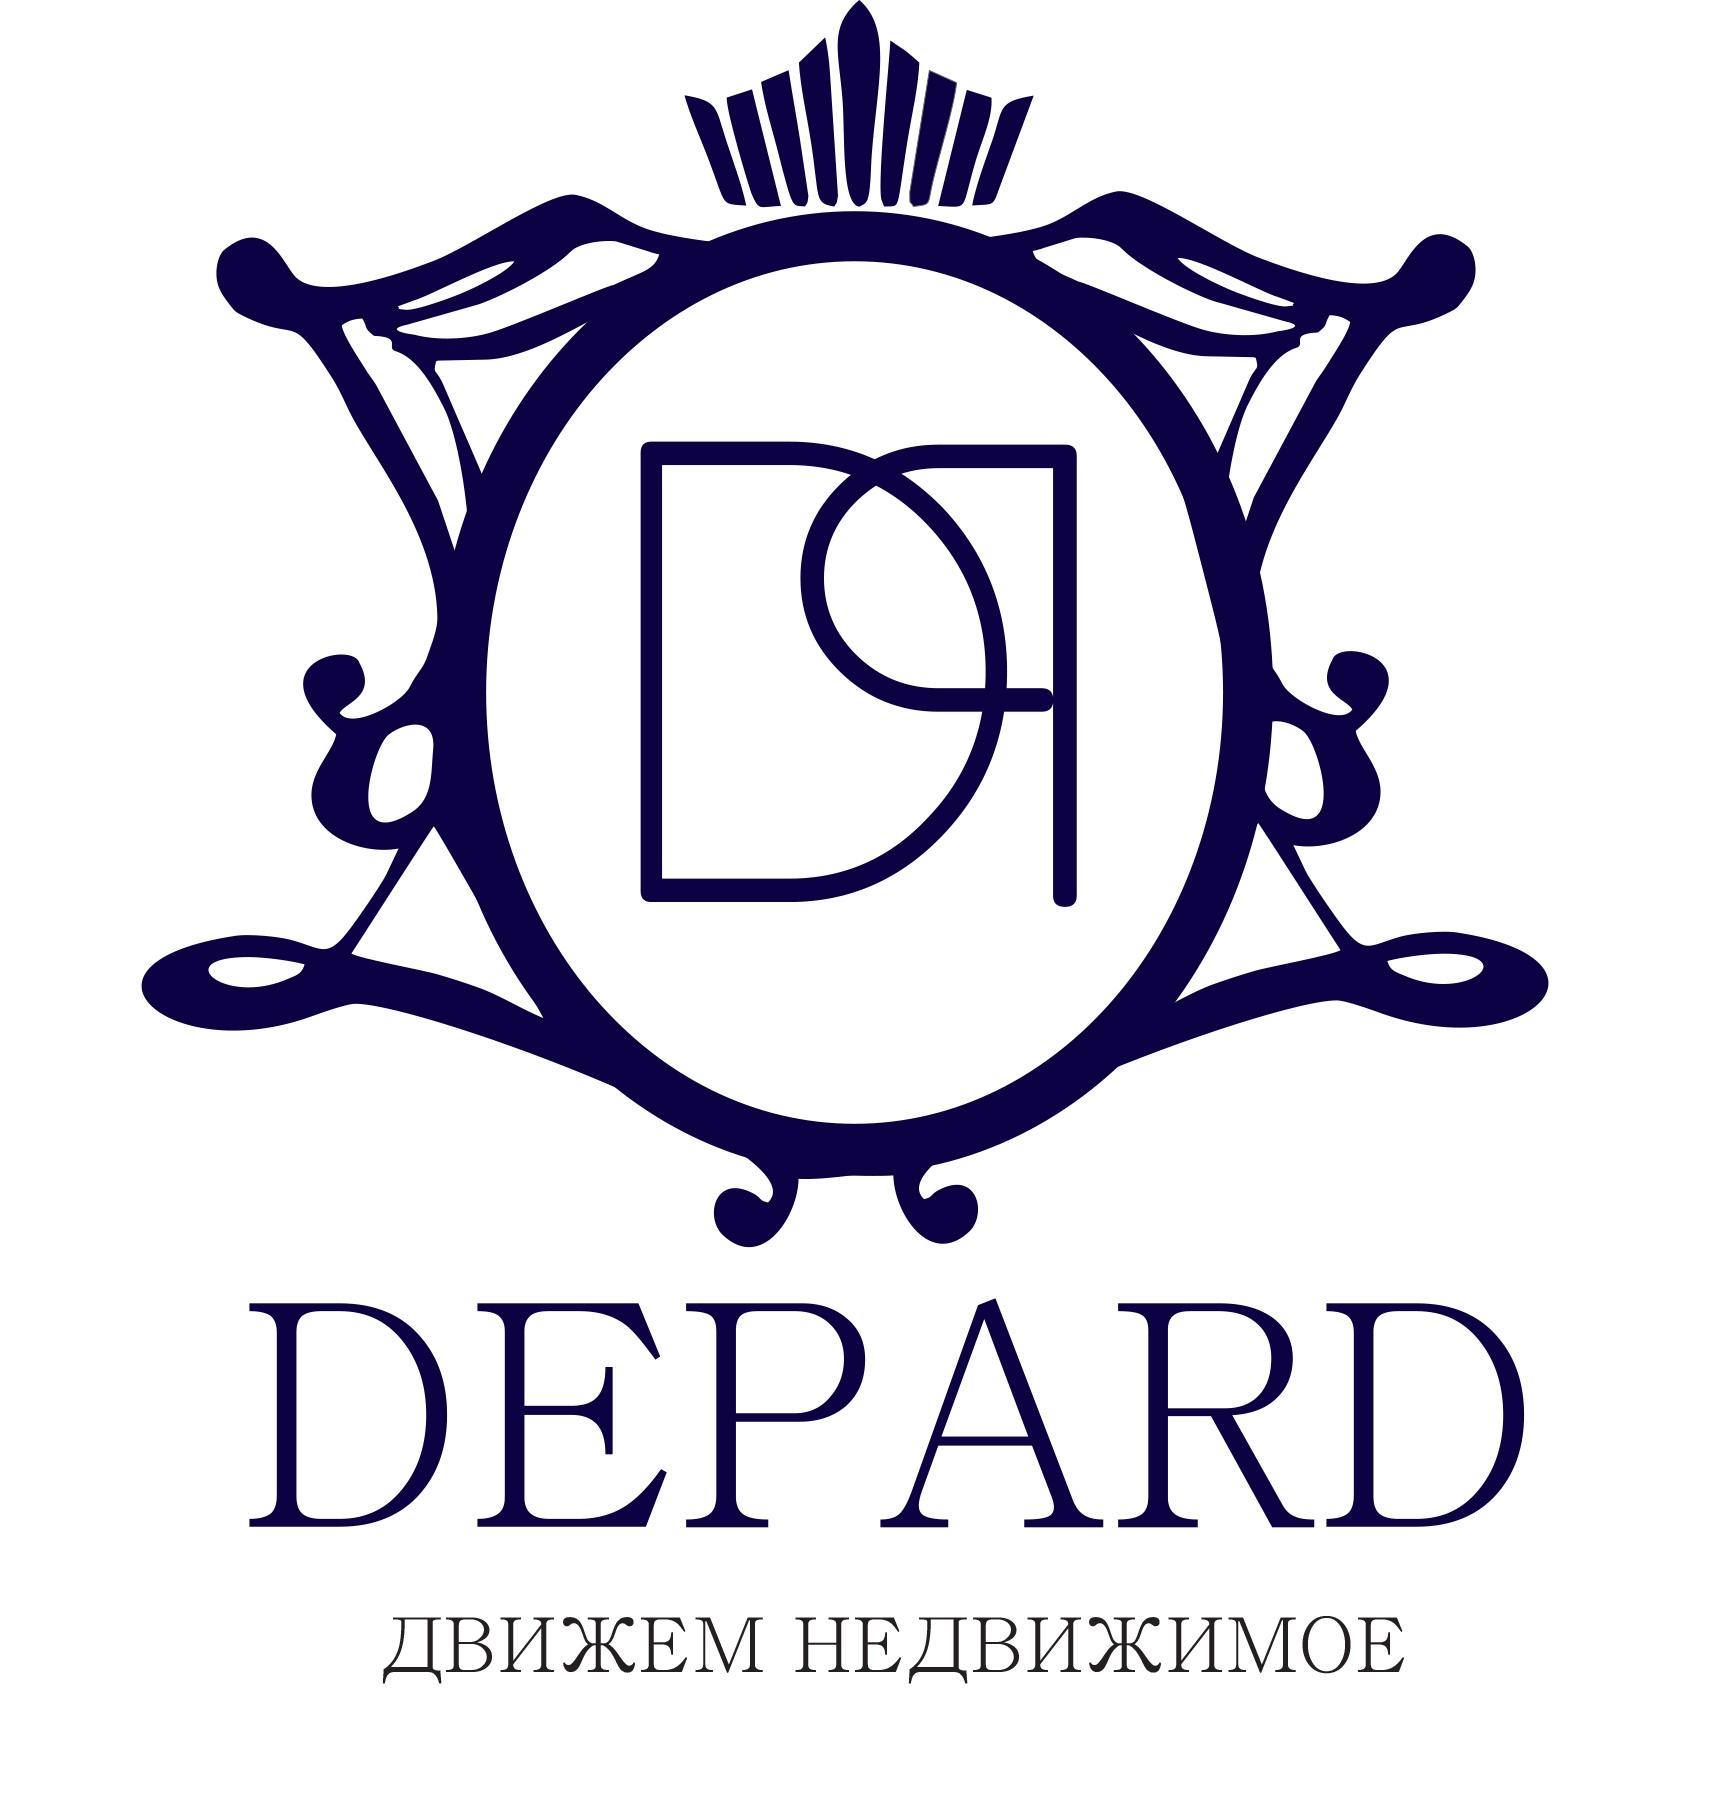 Логотип для компании (услуги недвижимость) фото f_92959315a8e370bc.jpg